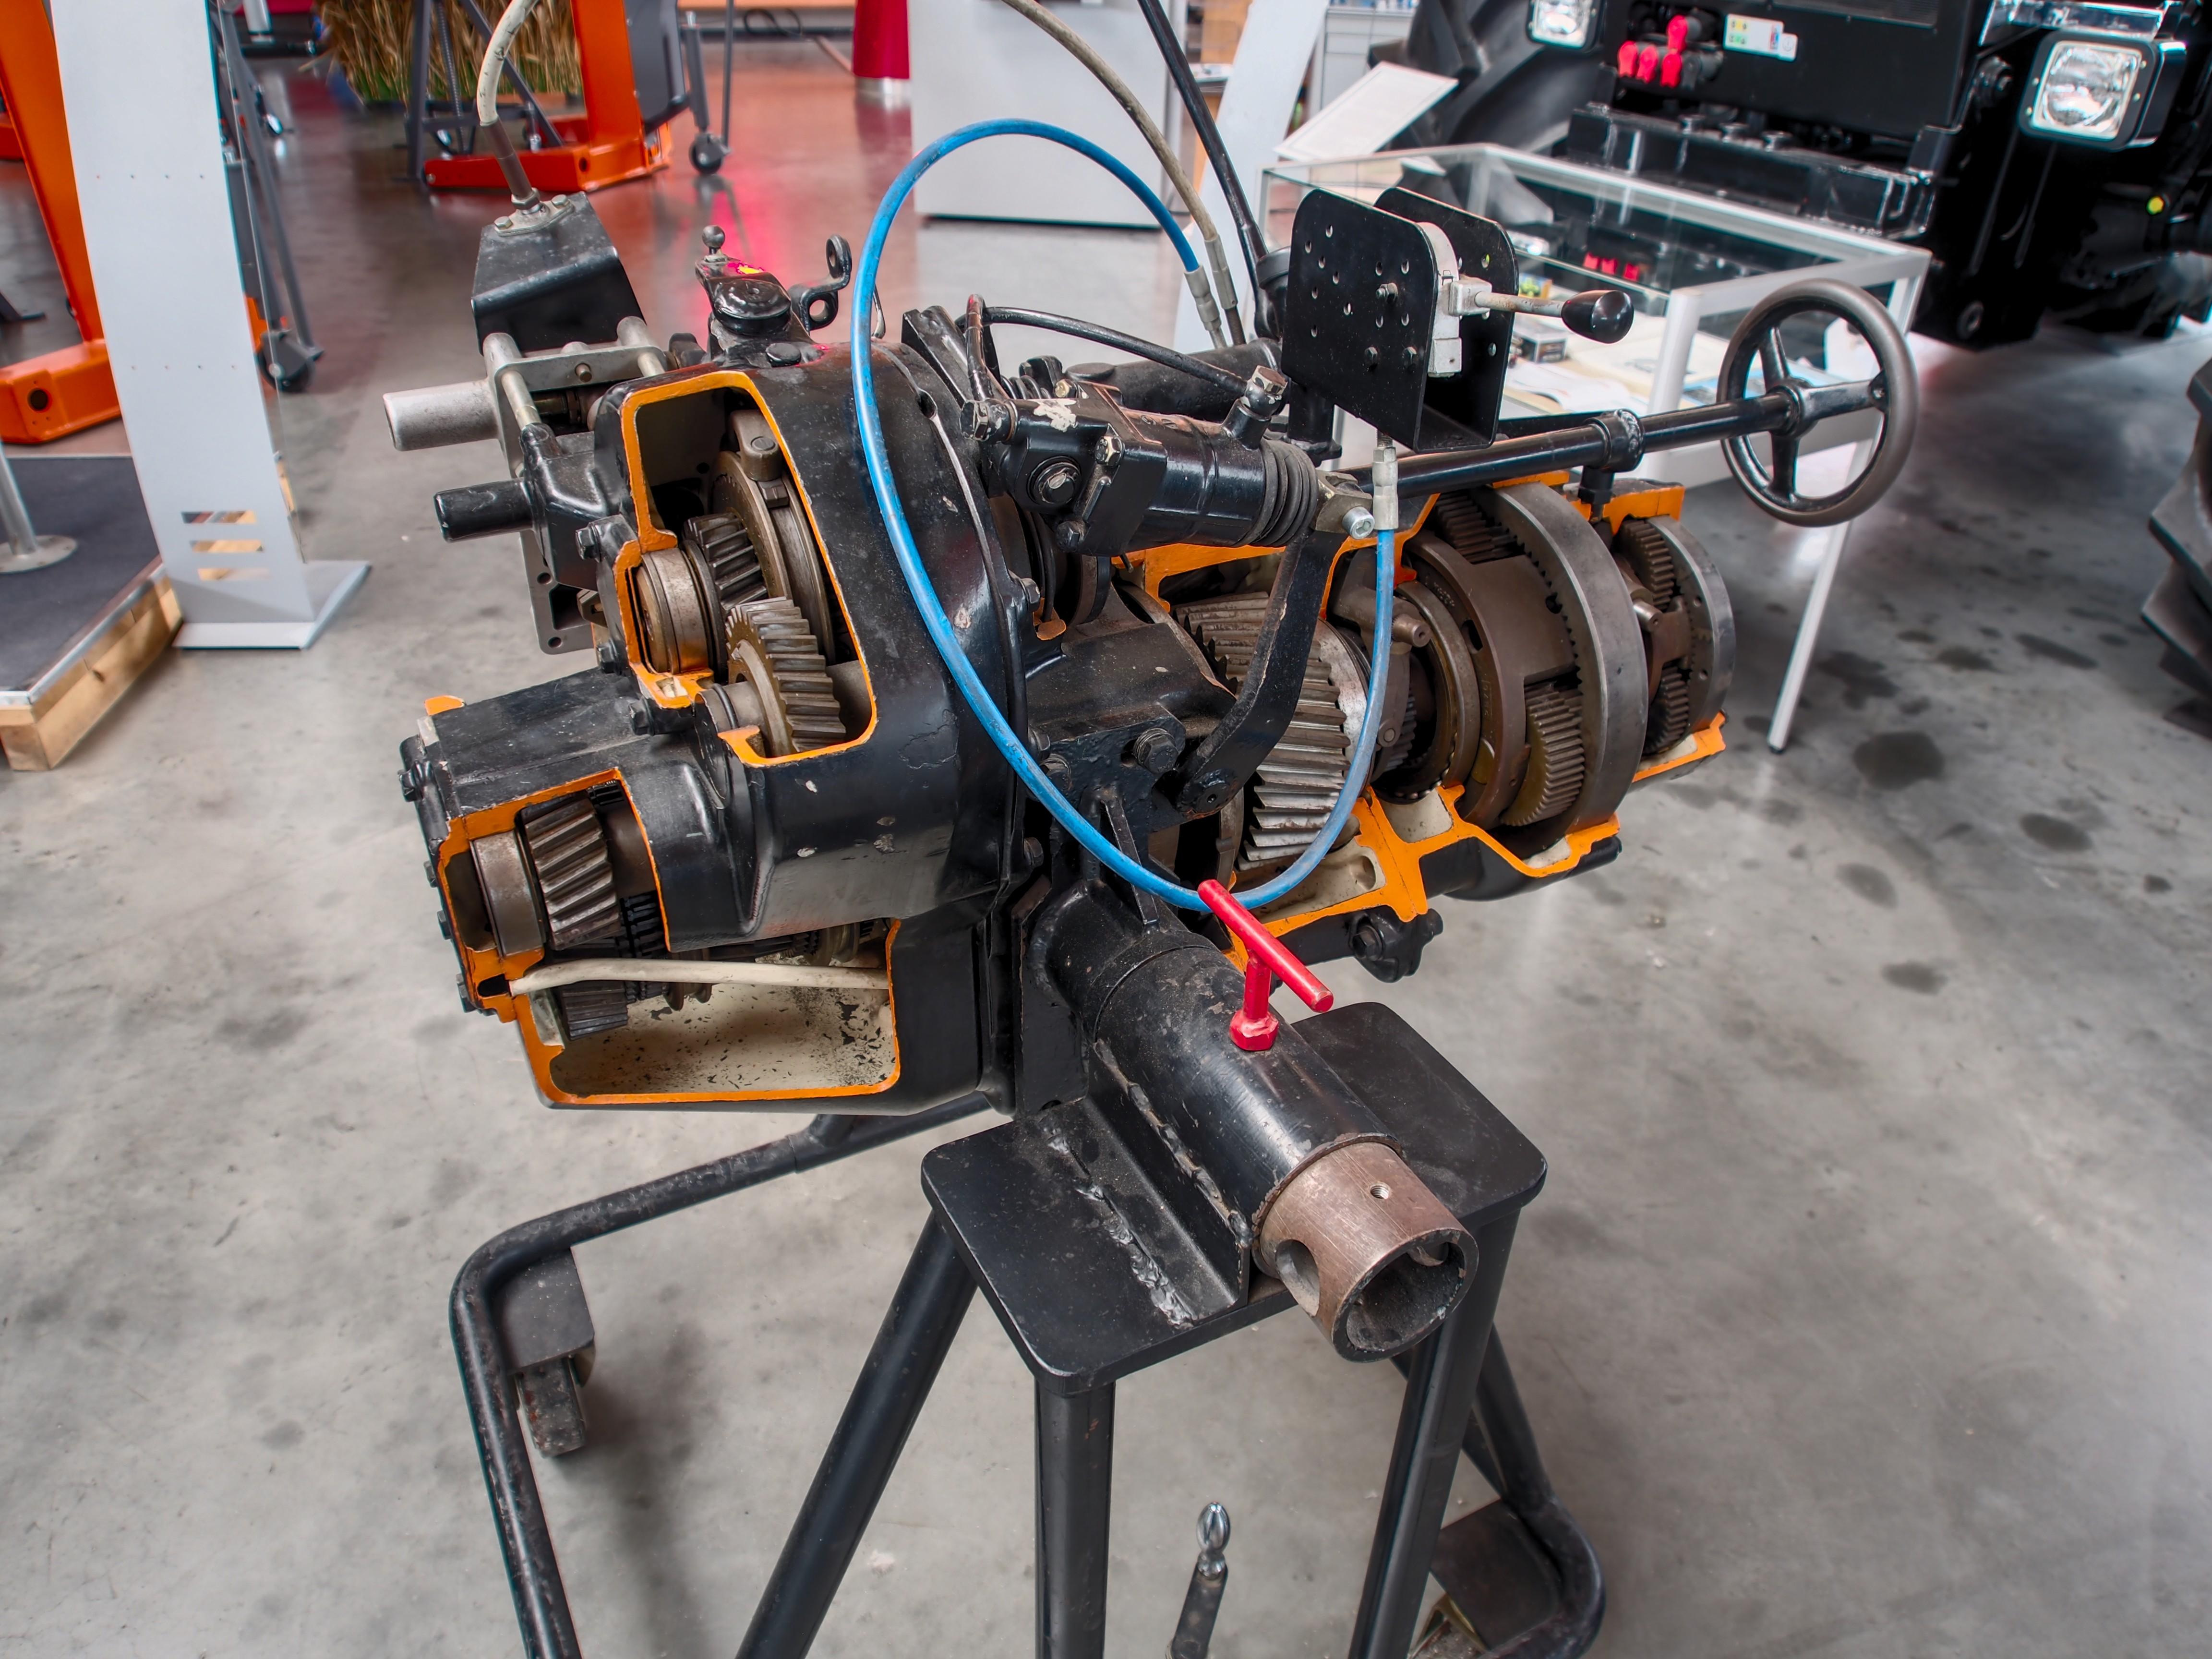 File:Unimog Getriebe, Unimoc Museum Bild 1.jpg - Wikimedia Commons